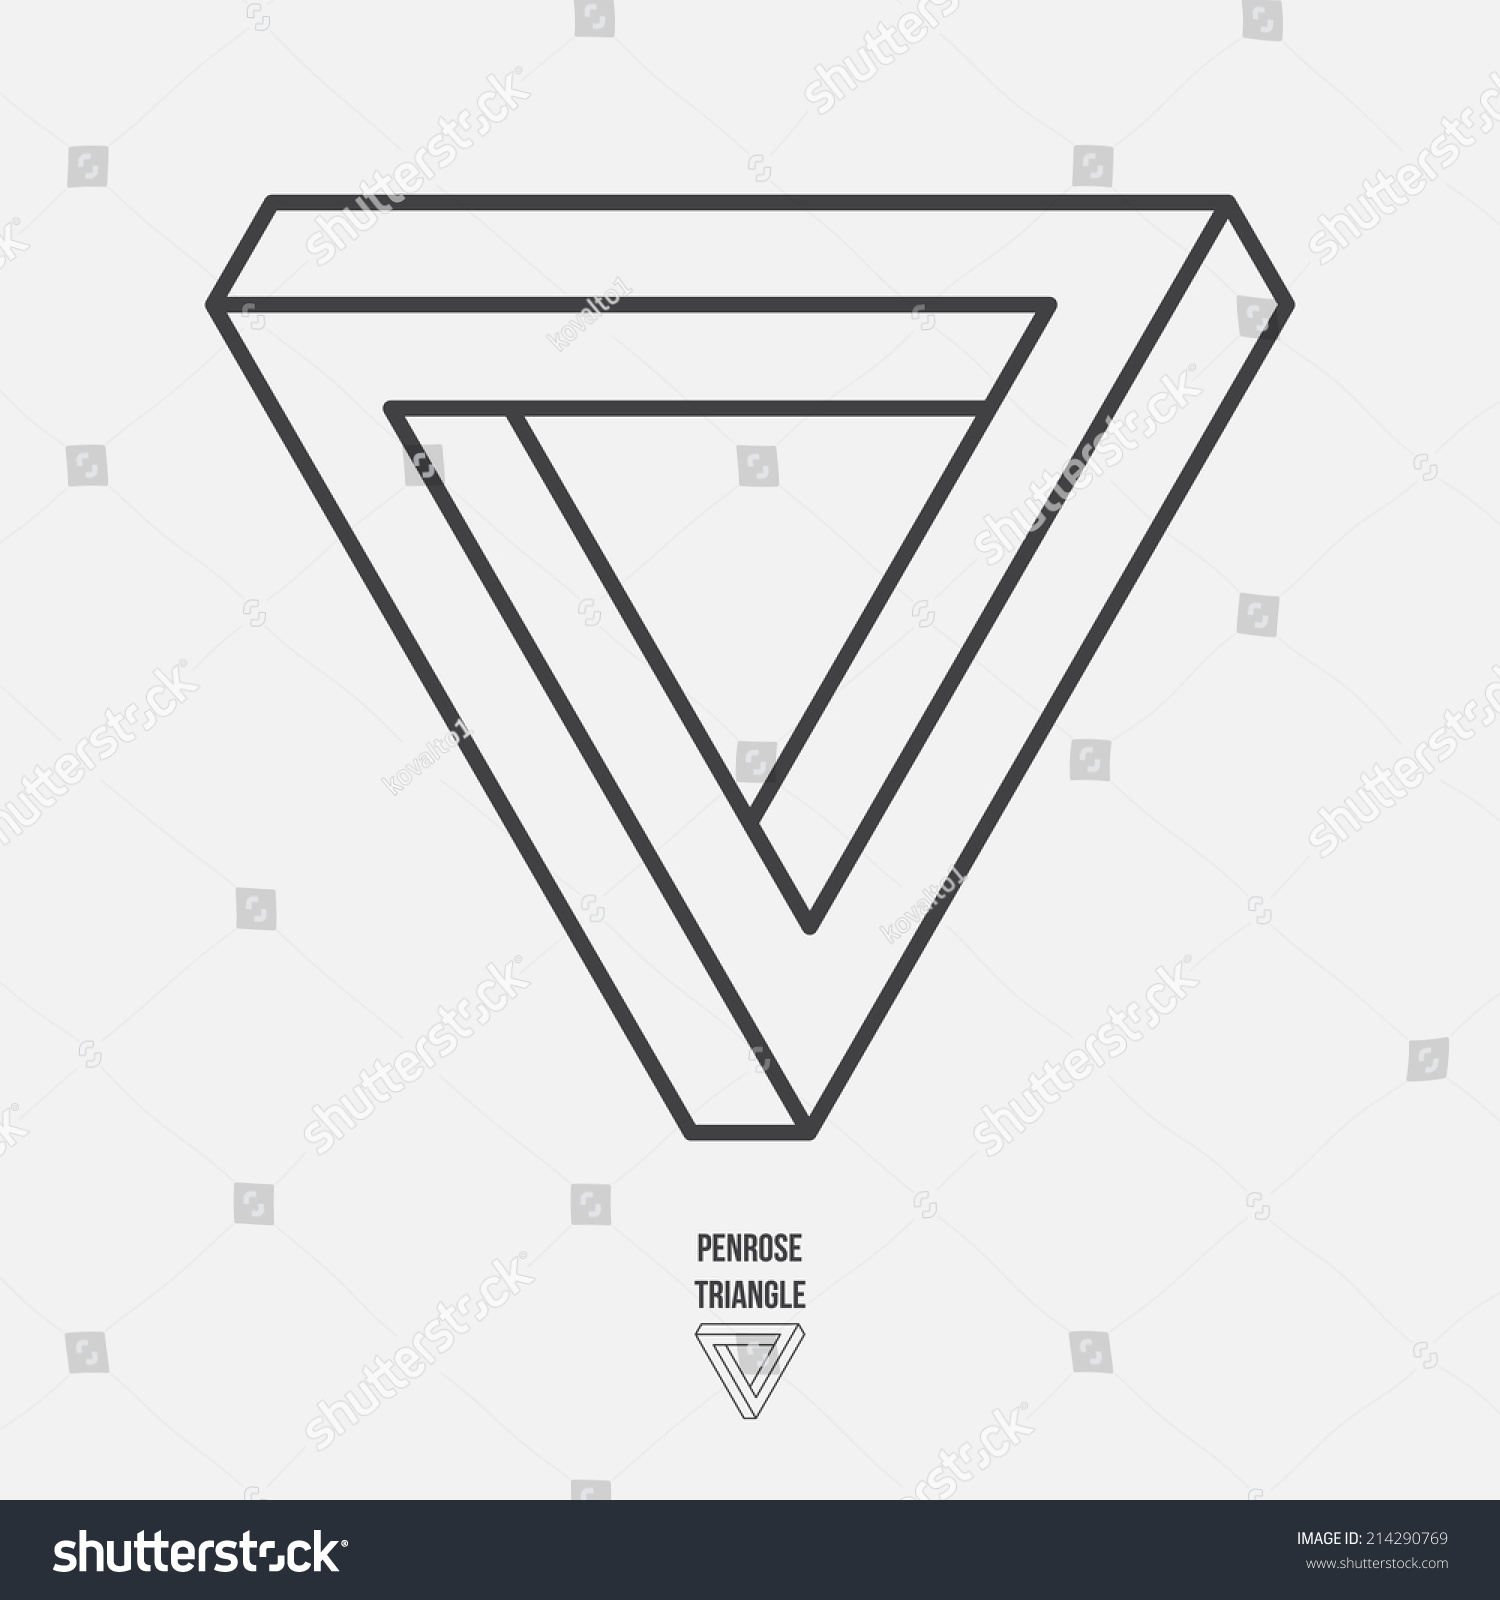 penrose triangle line design vector illustration のベクター画像素材